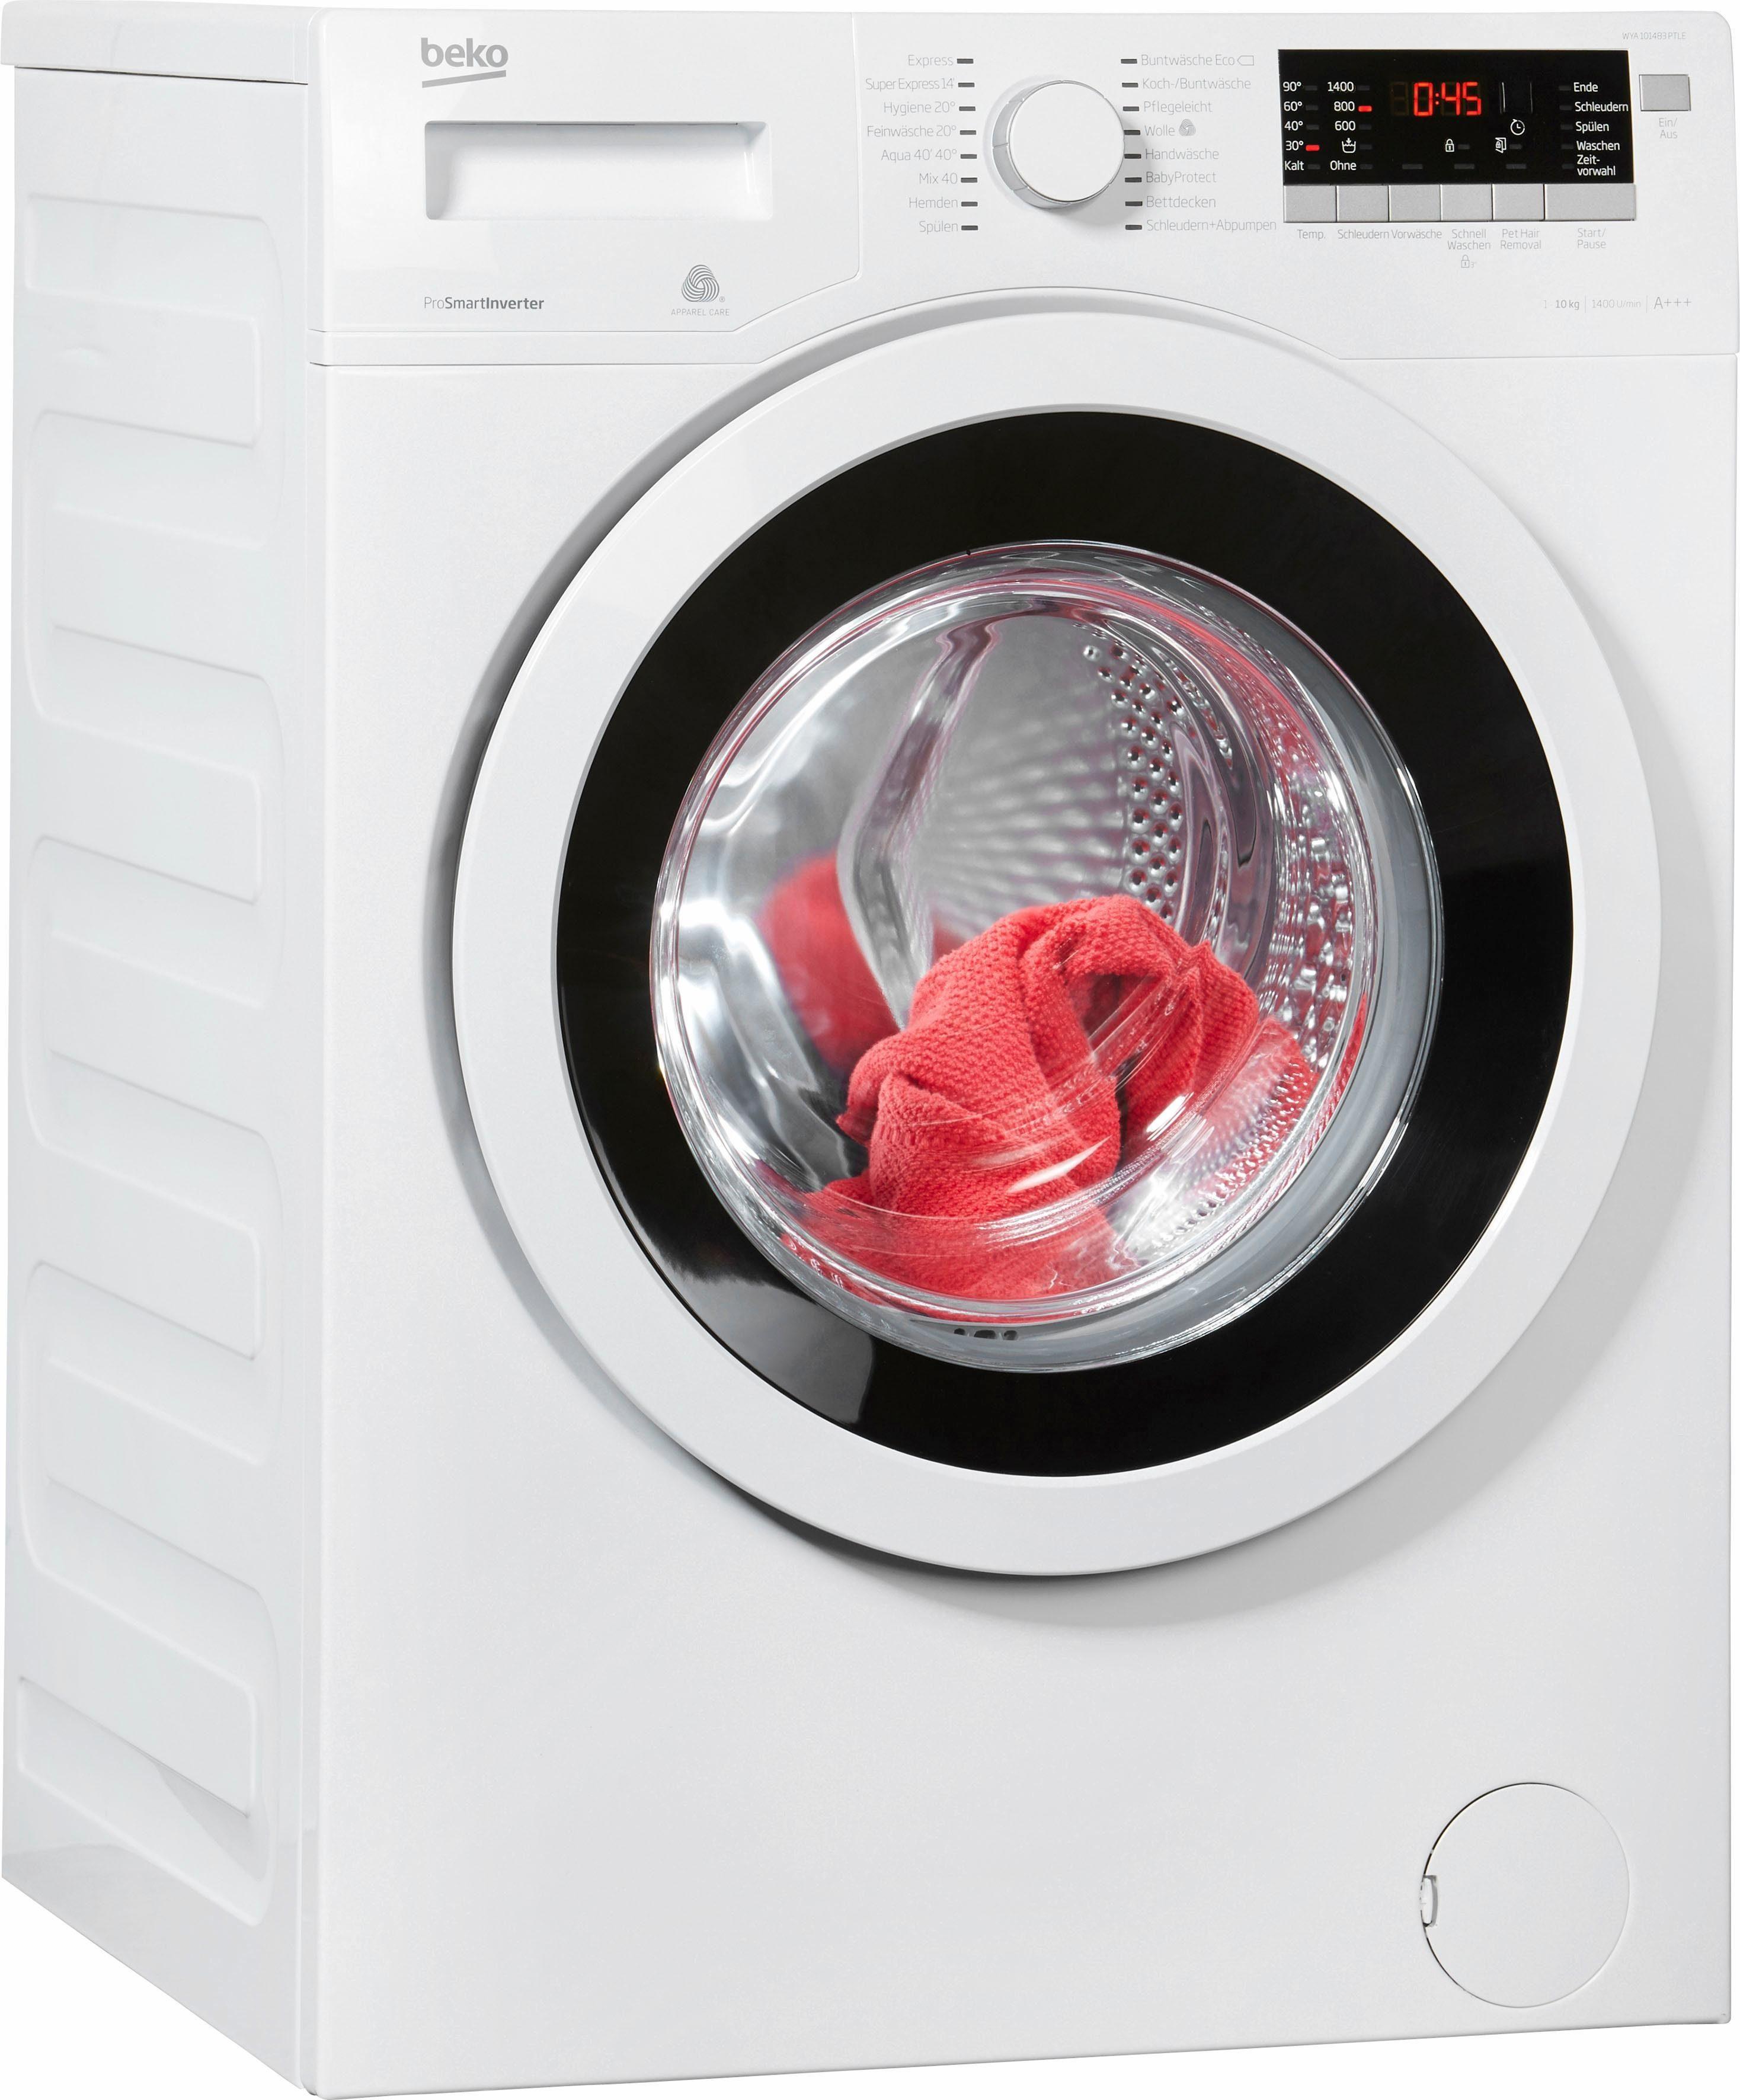 BEKO Waschmaschine WYA 101483 PTLE, 10 kg, 1400 U/Min